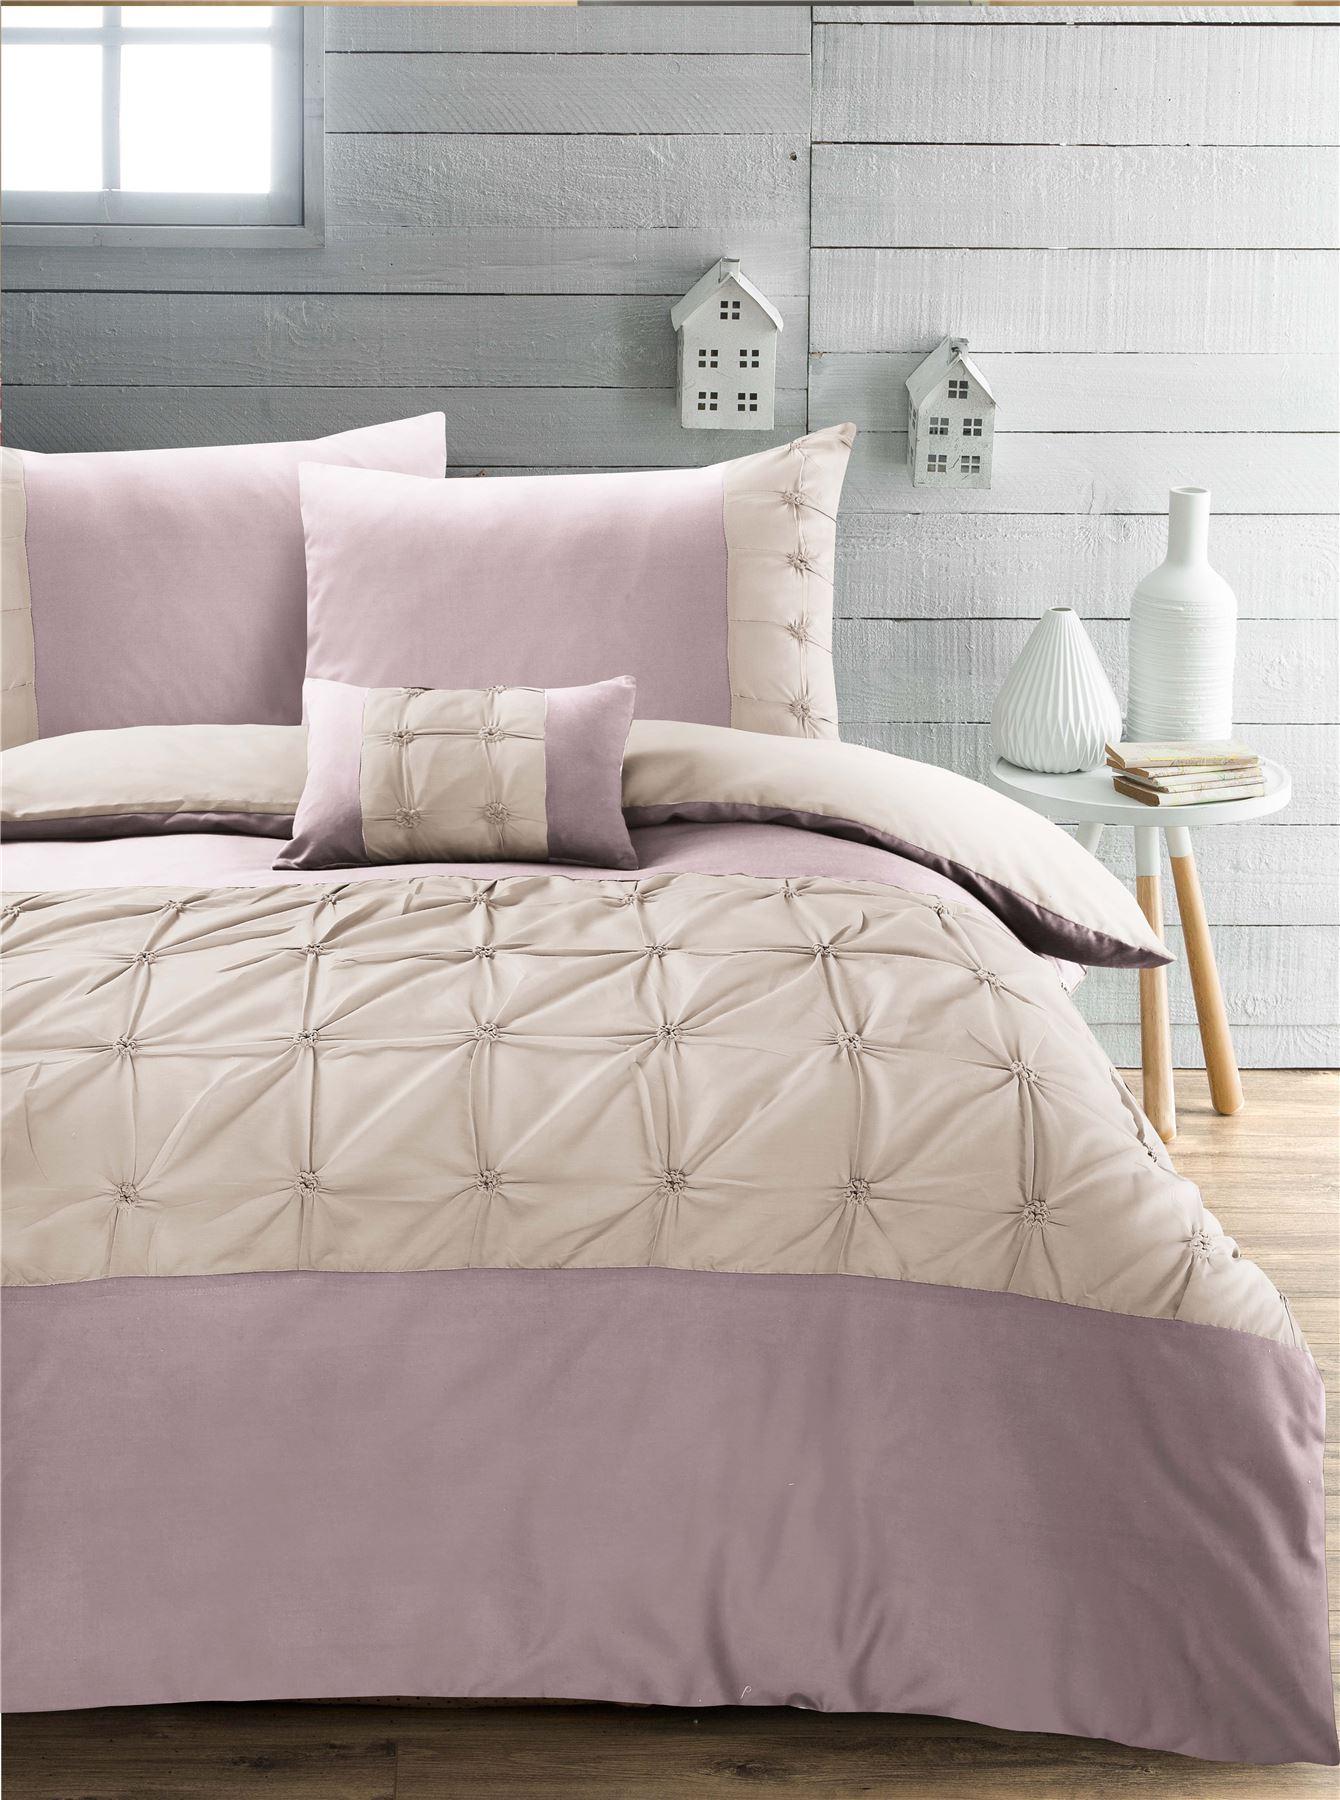 duvet linen quilt koo bed covers cover ruched bella set nz white